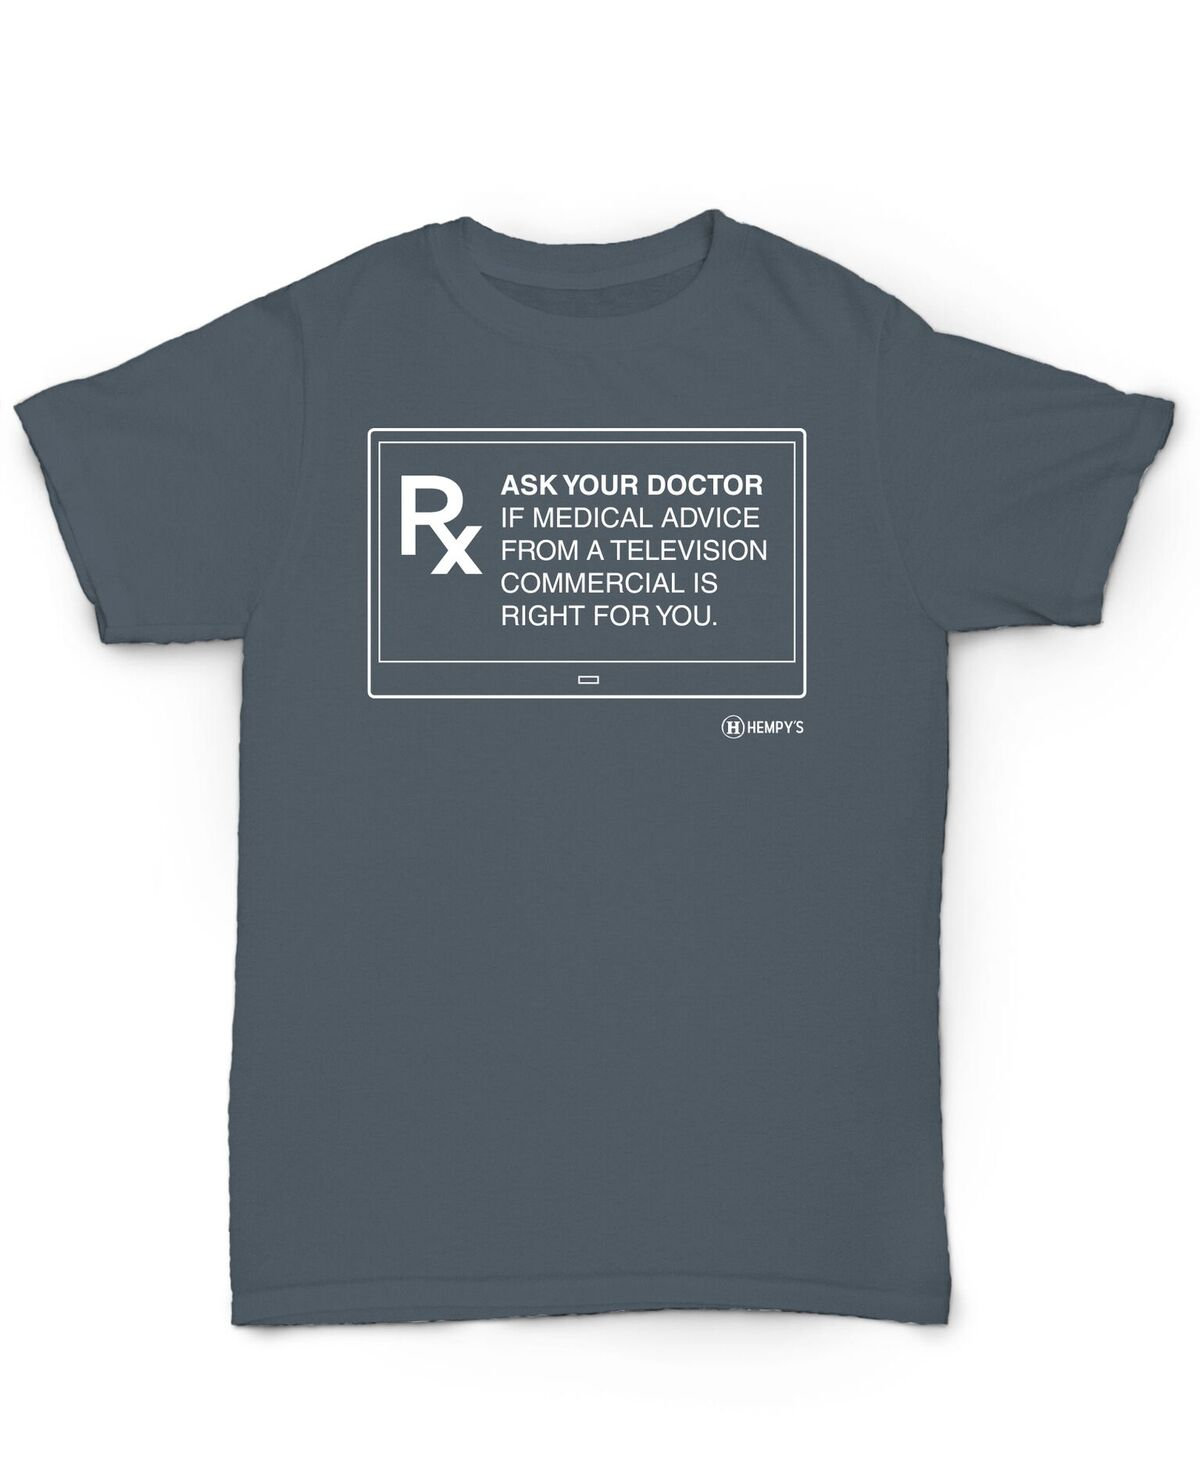 Hemp T Shirt - Ask Your Doctor - Hempys